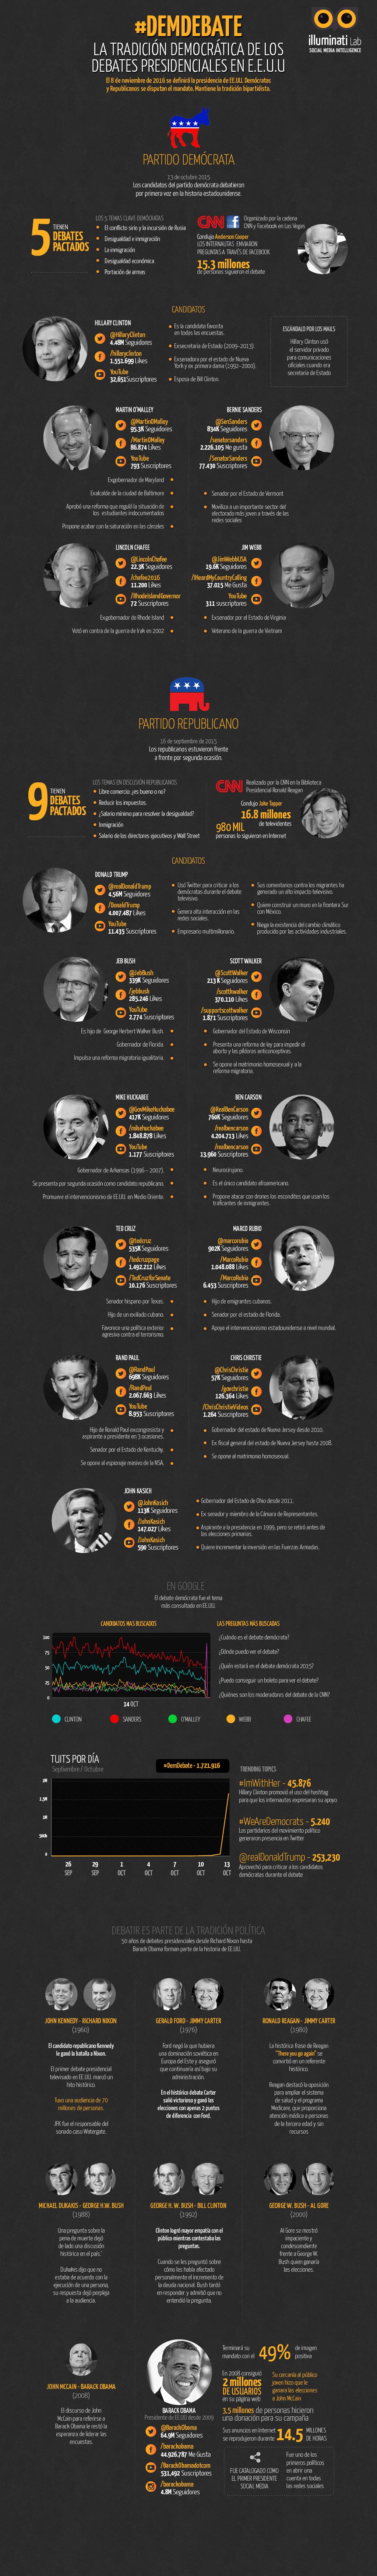 Infografia_debate_eeuu